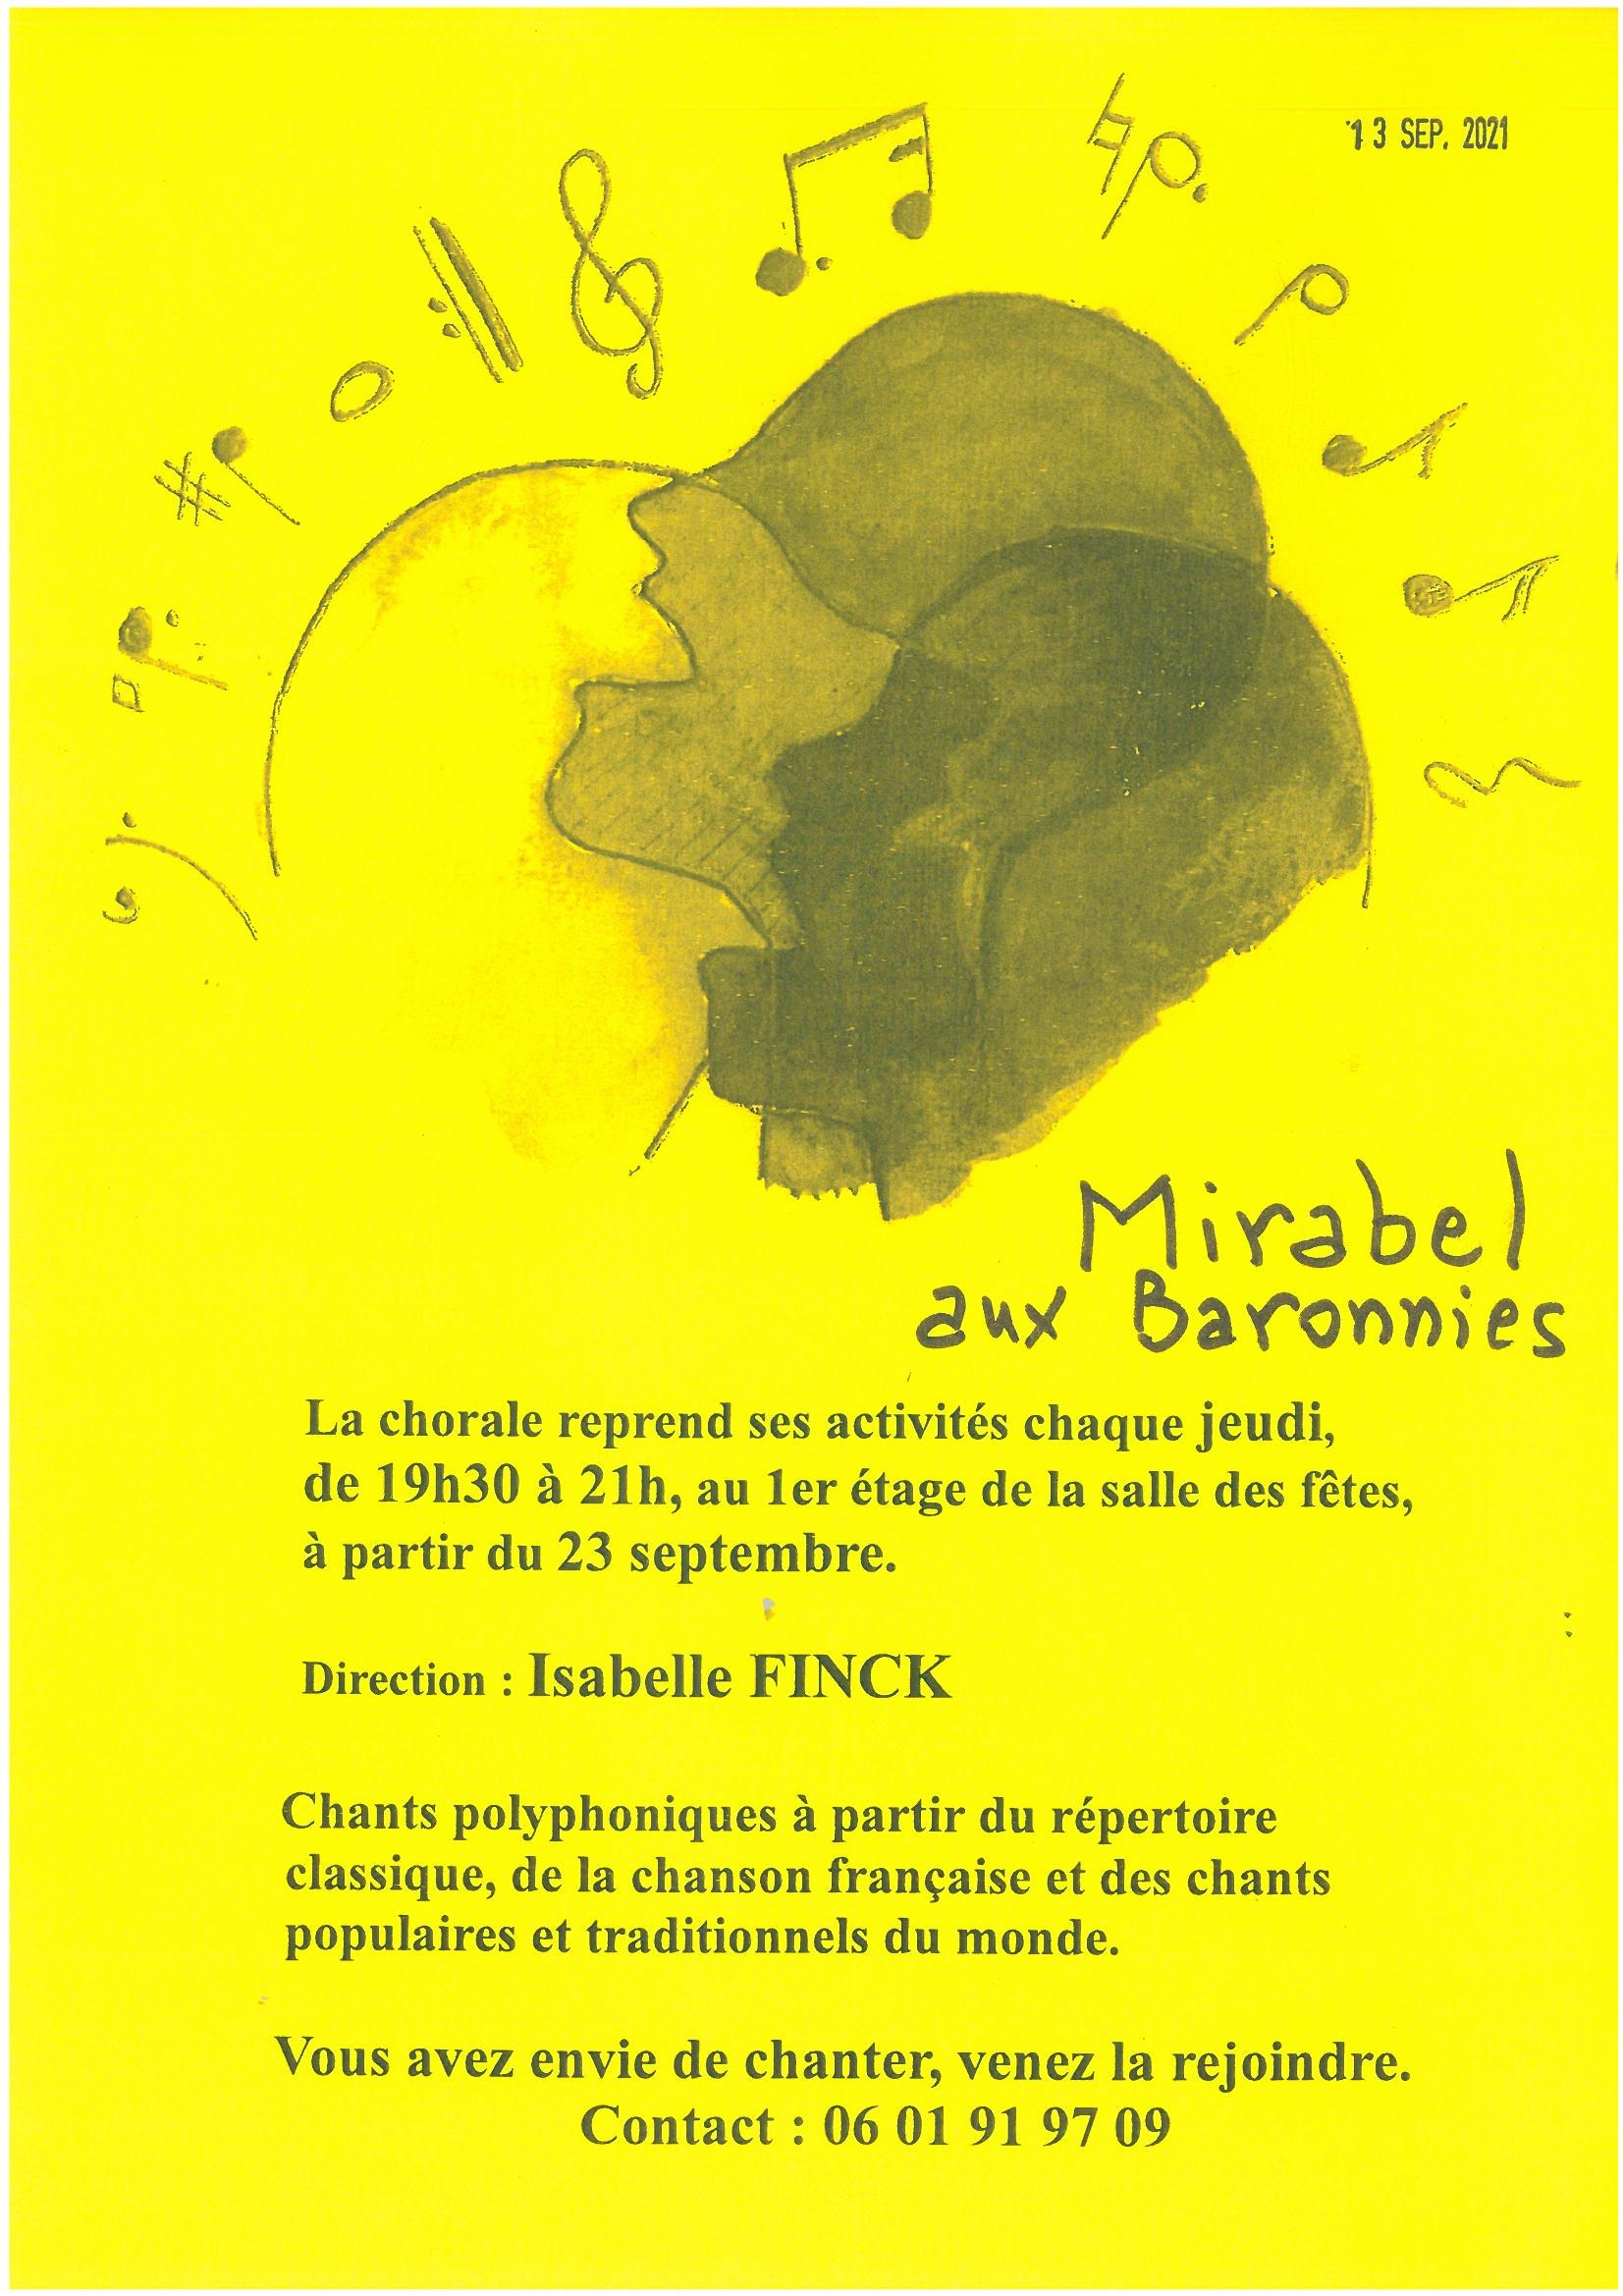 2021-09-13-Affiche-chorale